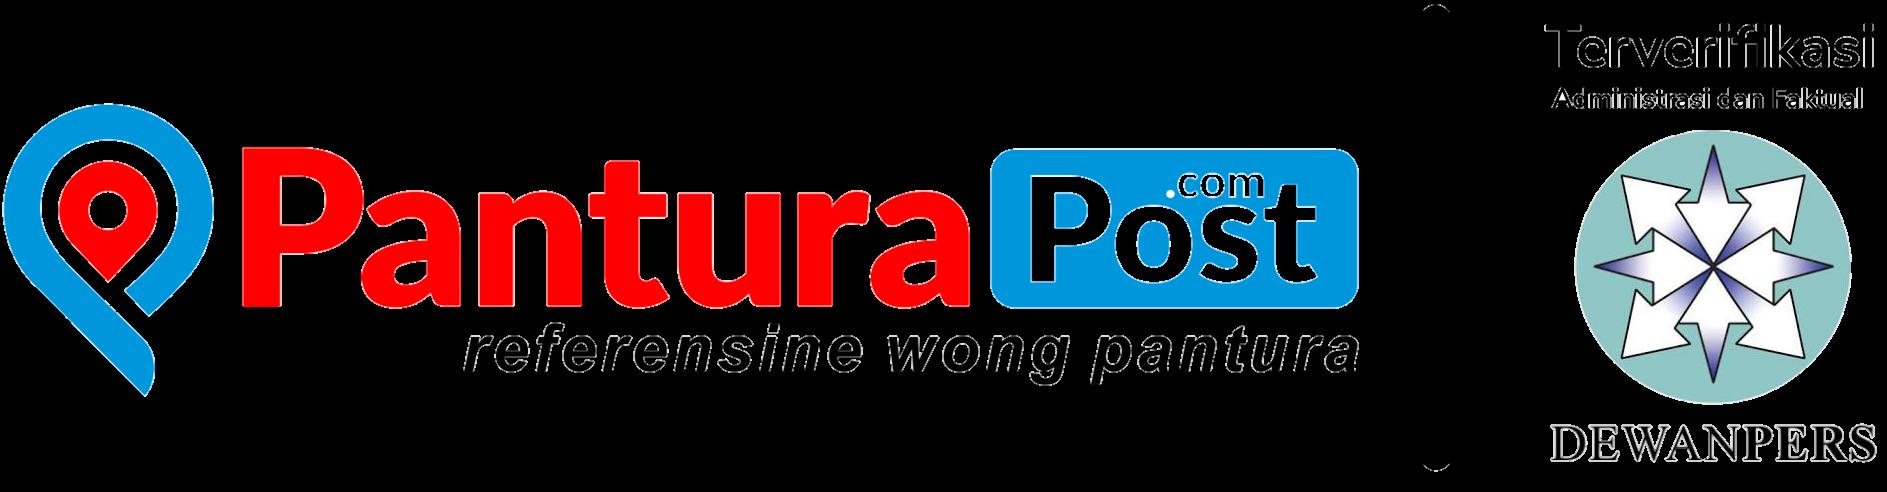 PanturaPost.com